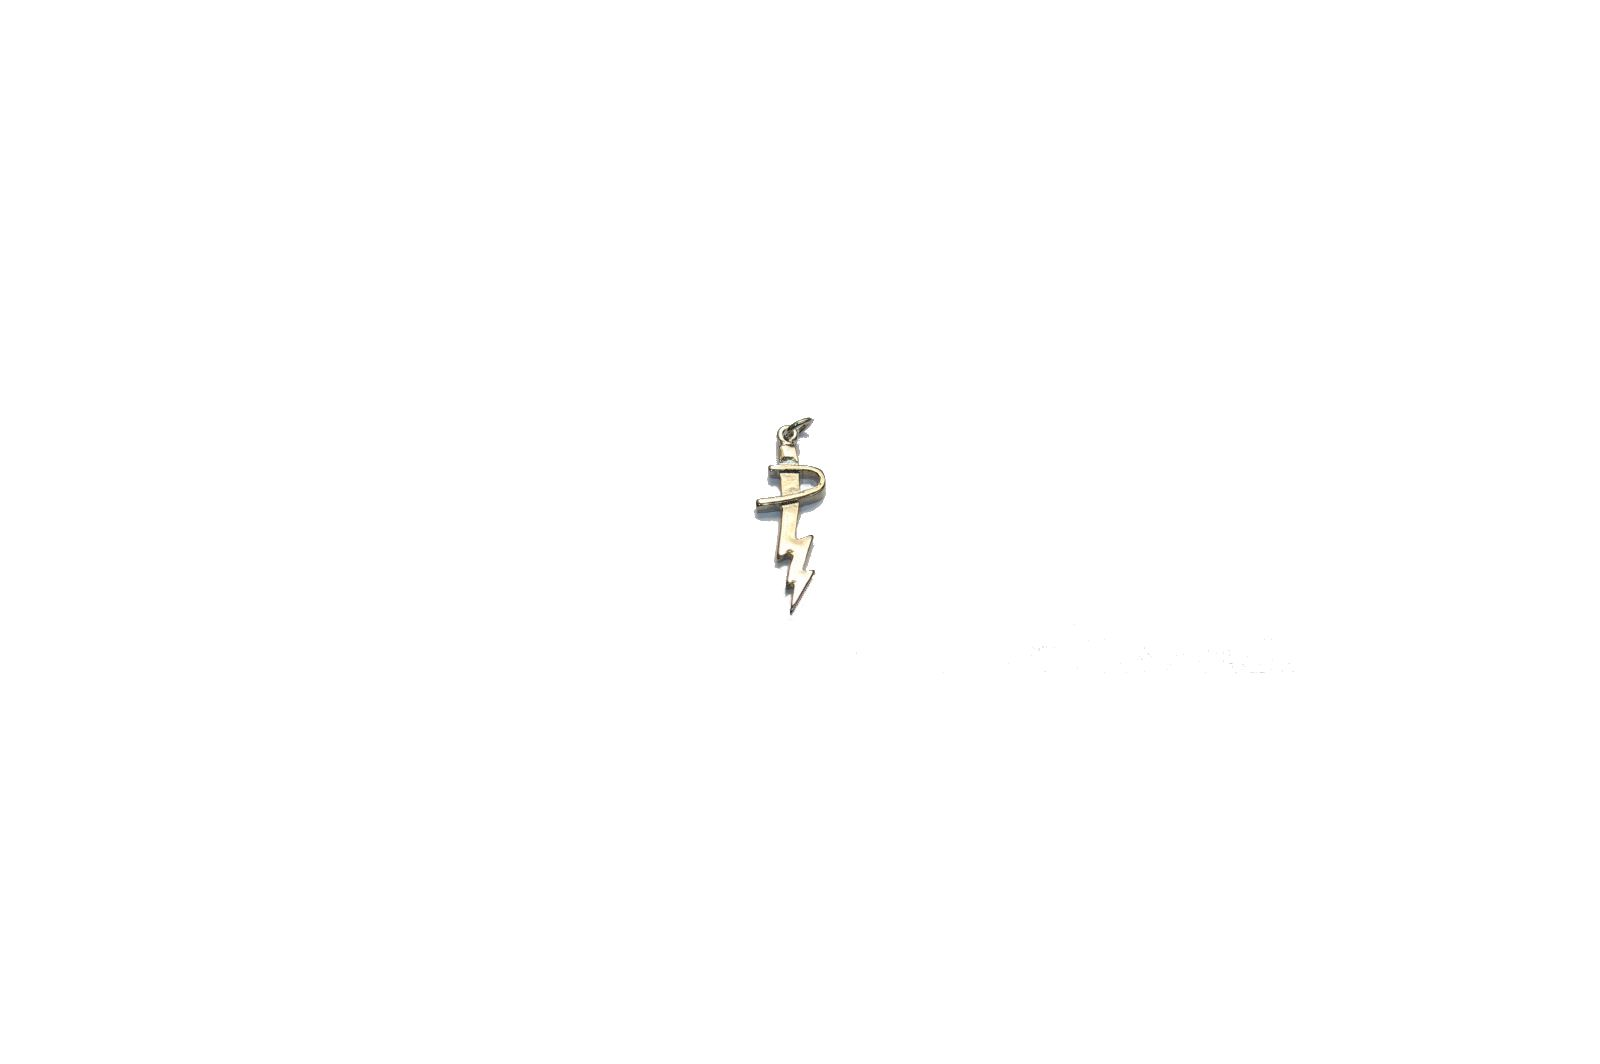 002 - Espada de Raio (P)